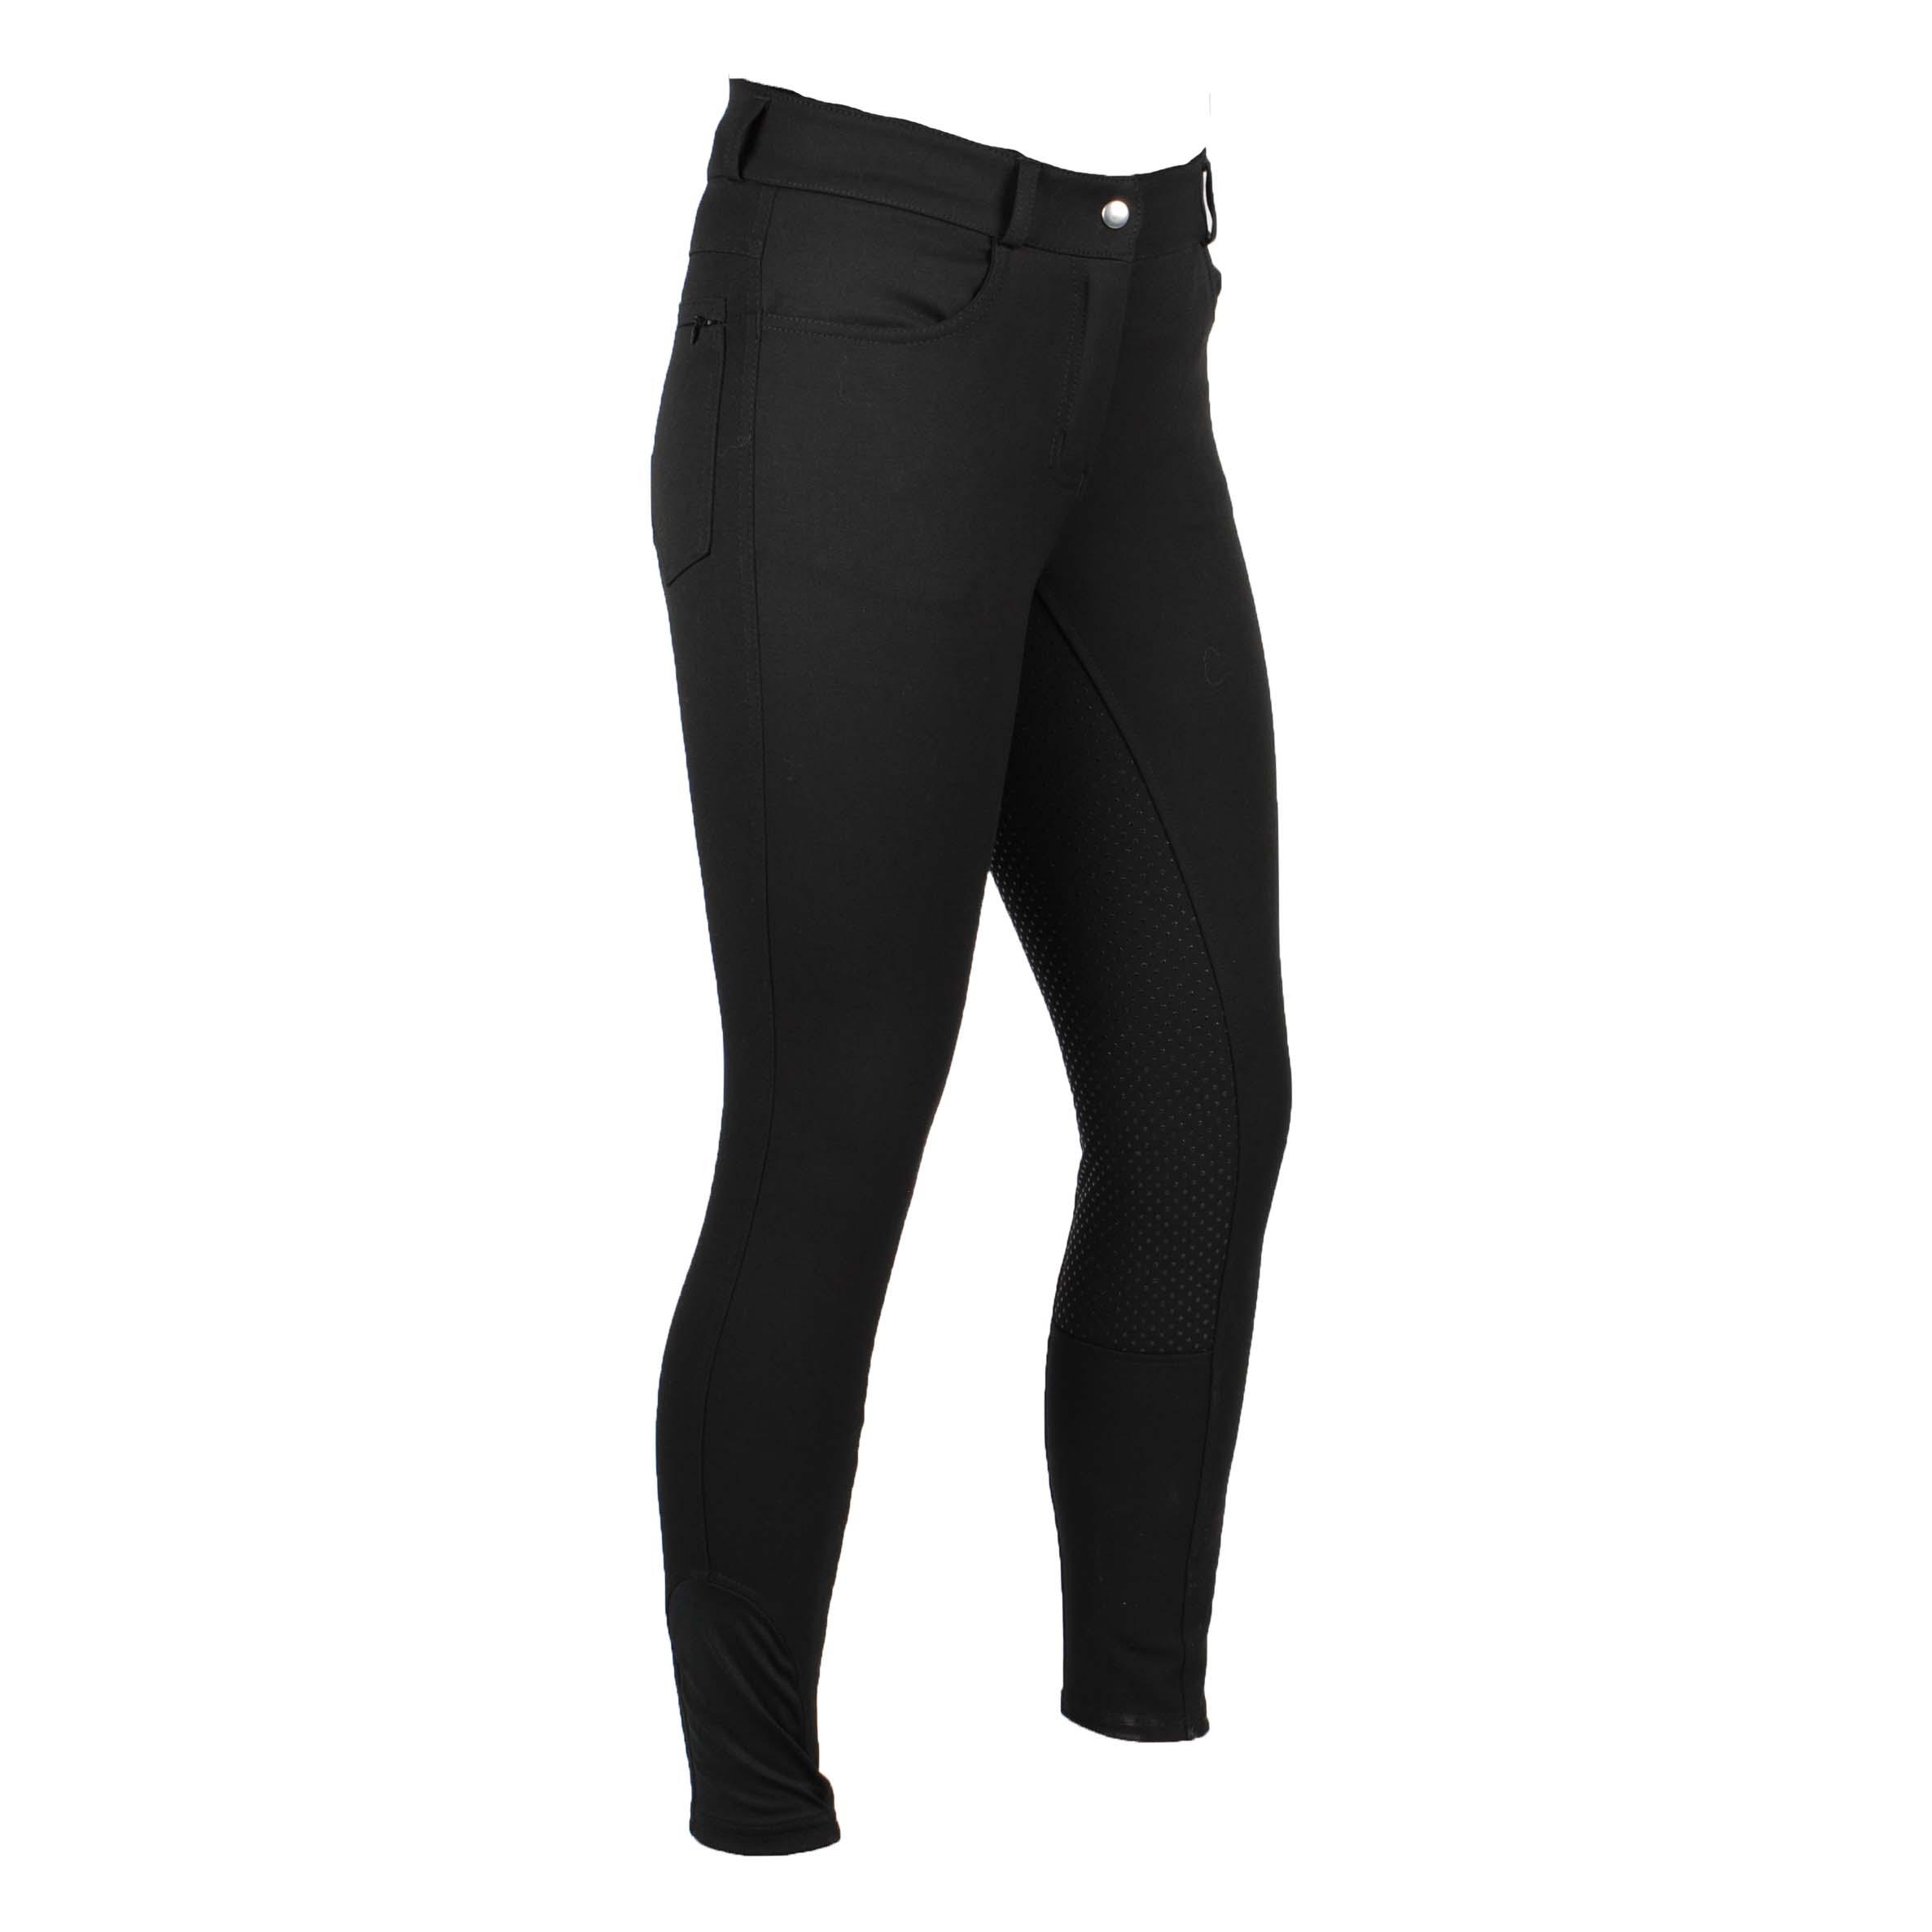 Mondoni Sada high waist full grip rijbroek zwart maat:40